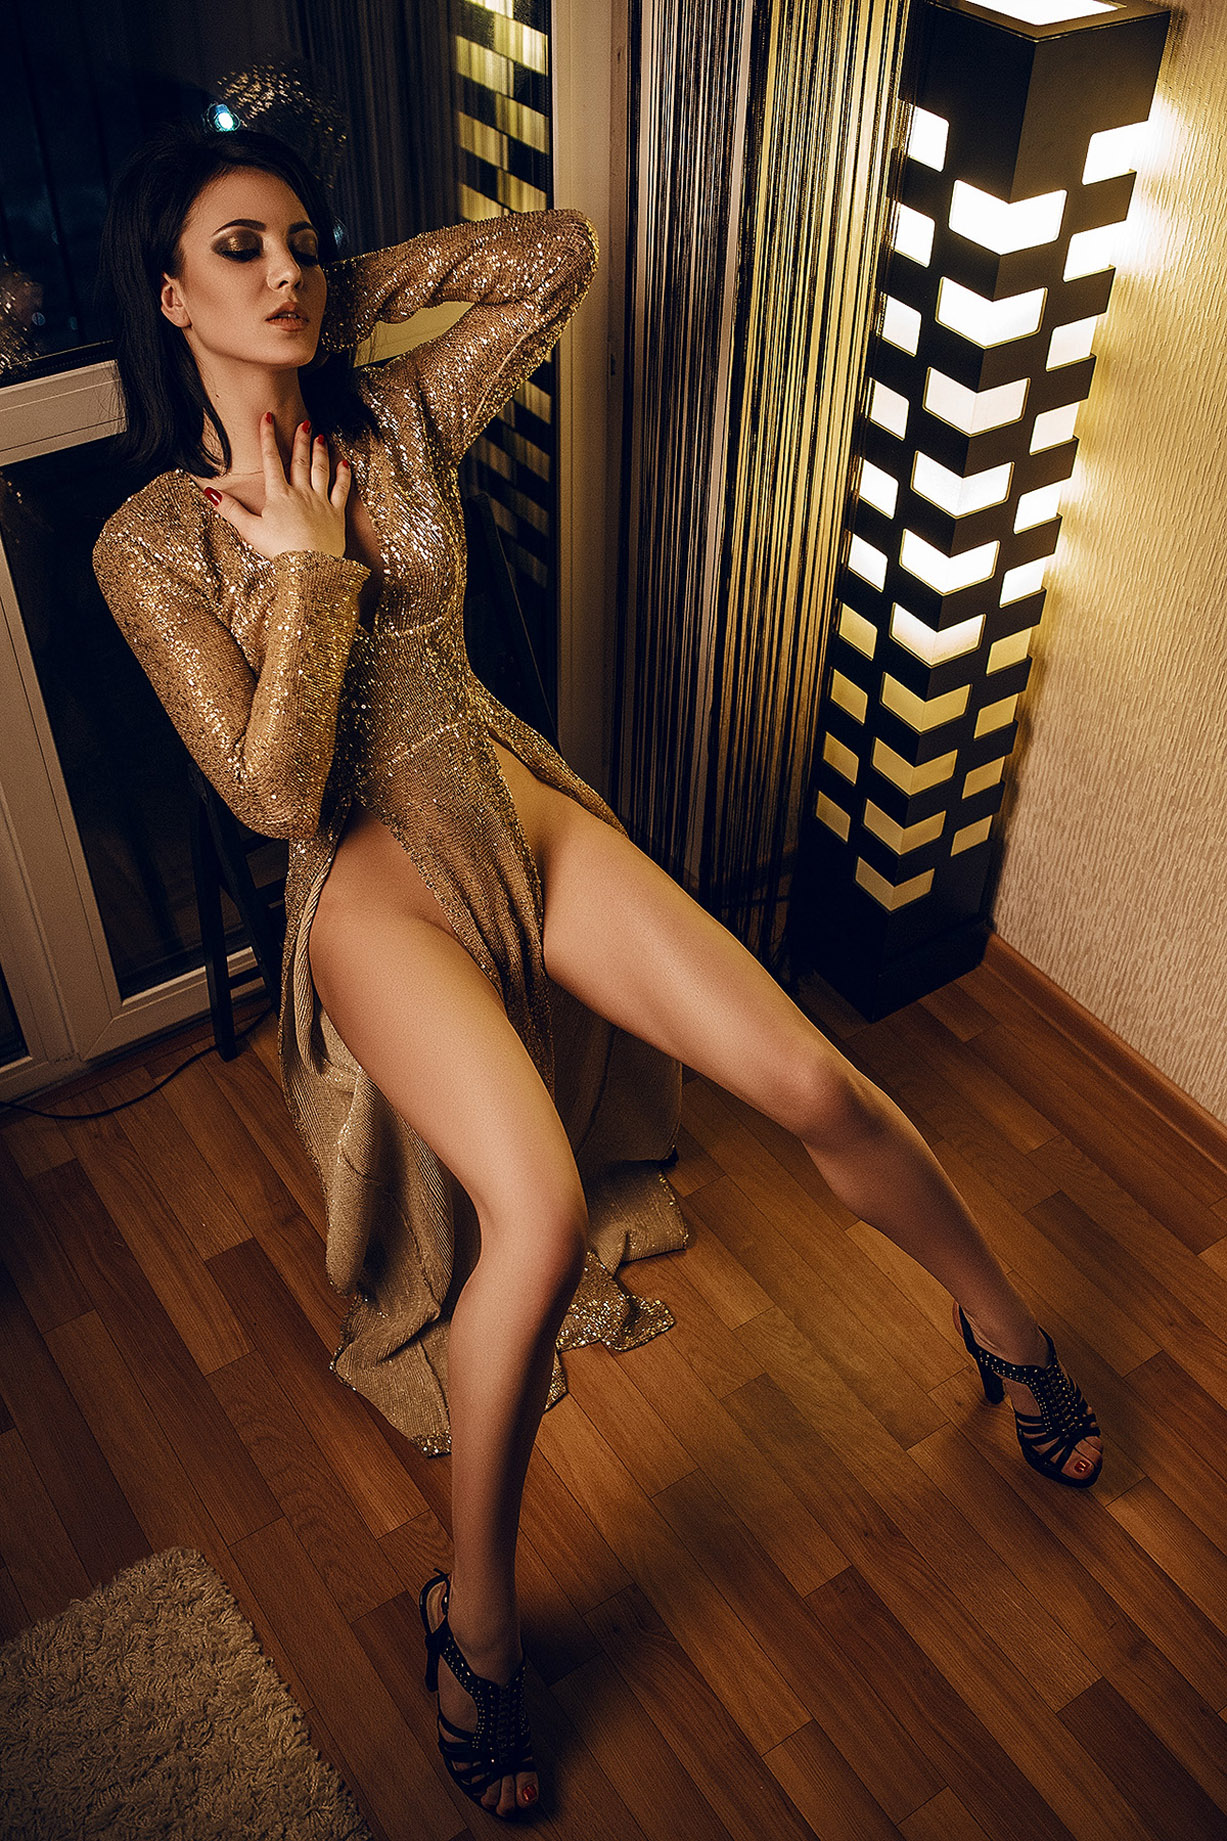 Девушка в золотом платье / Redji Gold by Max Microb